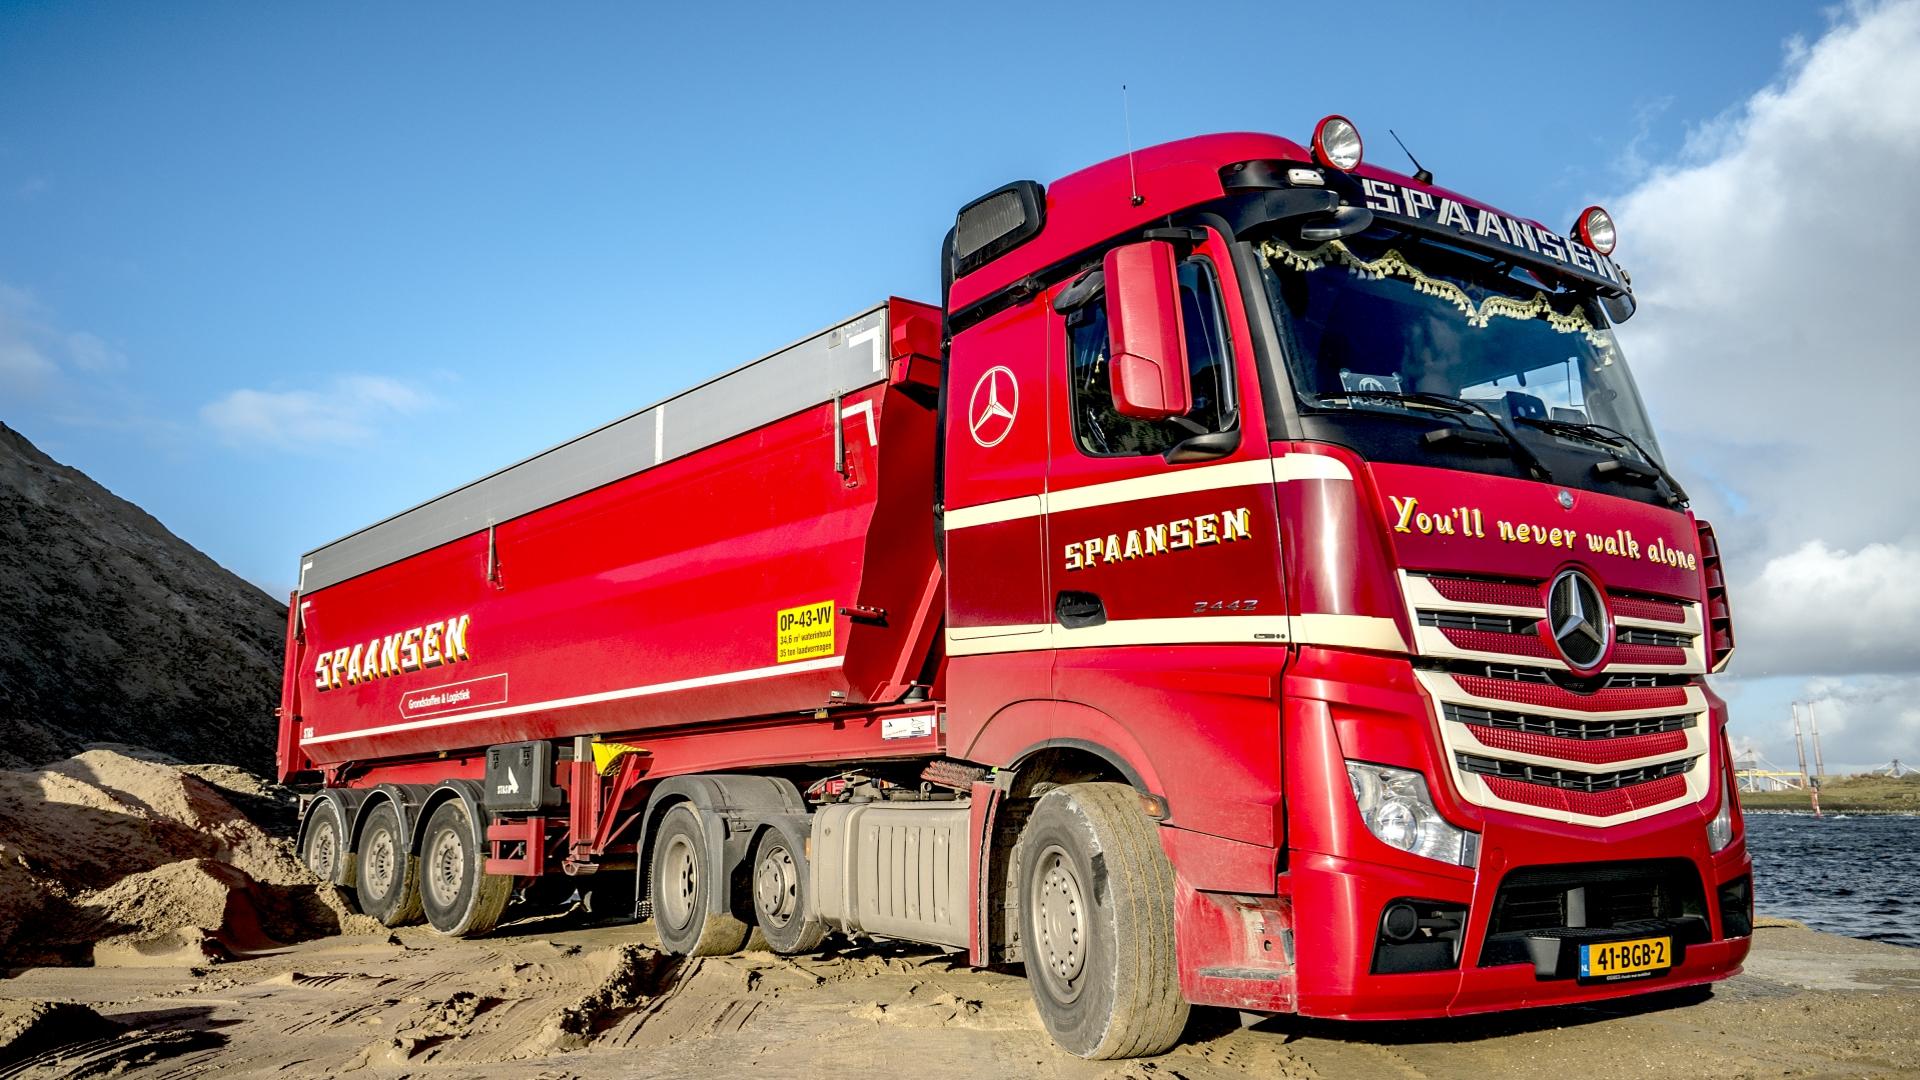 Vacature, Chauffeur, Transport, Winkel, Amsterdam, Kiptrailer, Spaansen Grondstoffen en Logistiek